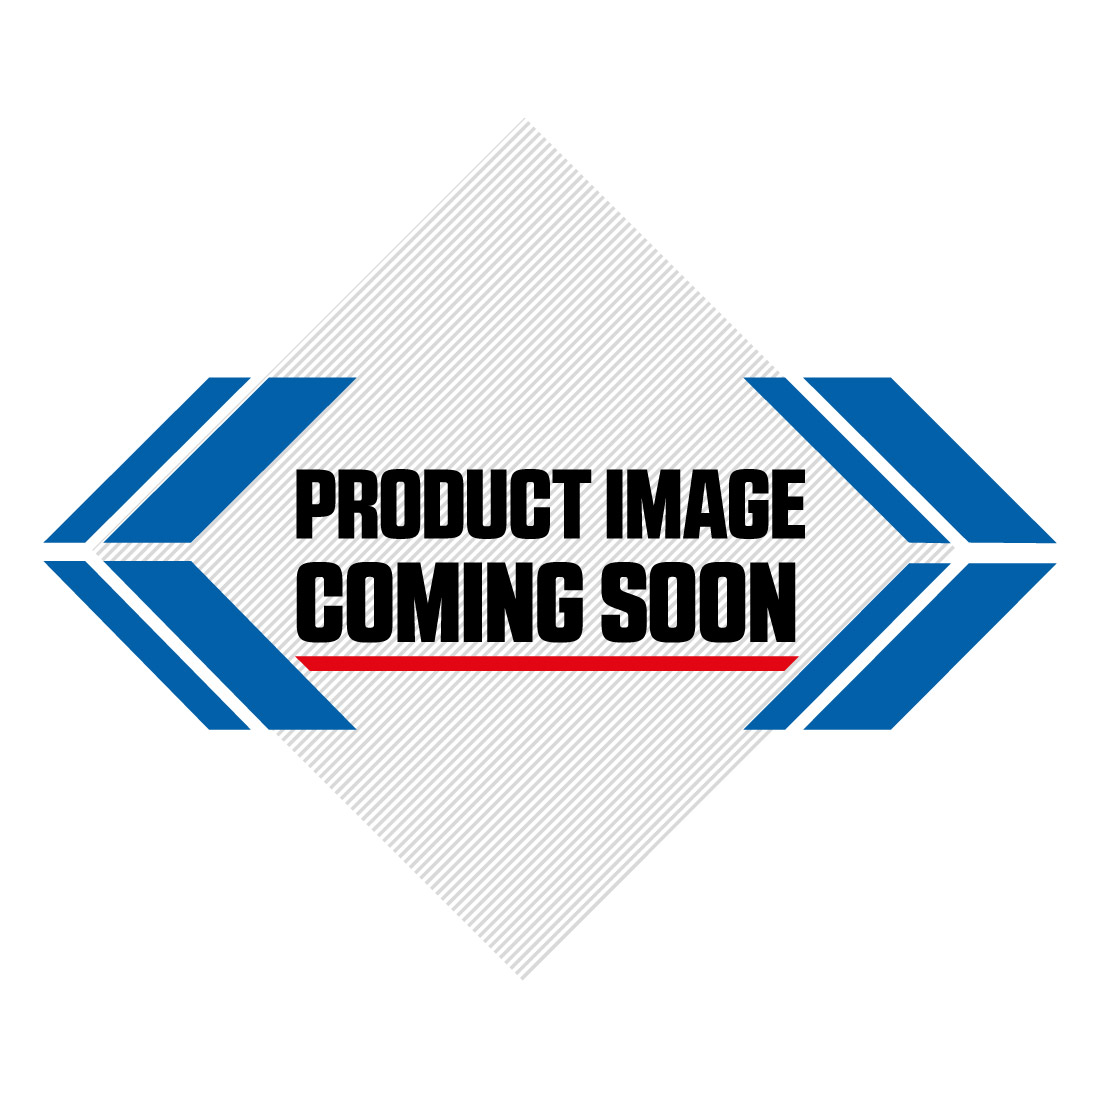 2019 UFO Interceptor 2 Helmet - Galaxy Limited Edition Image-3>